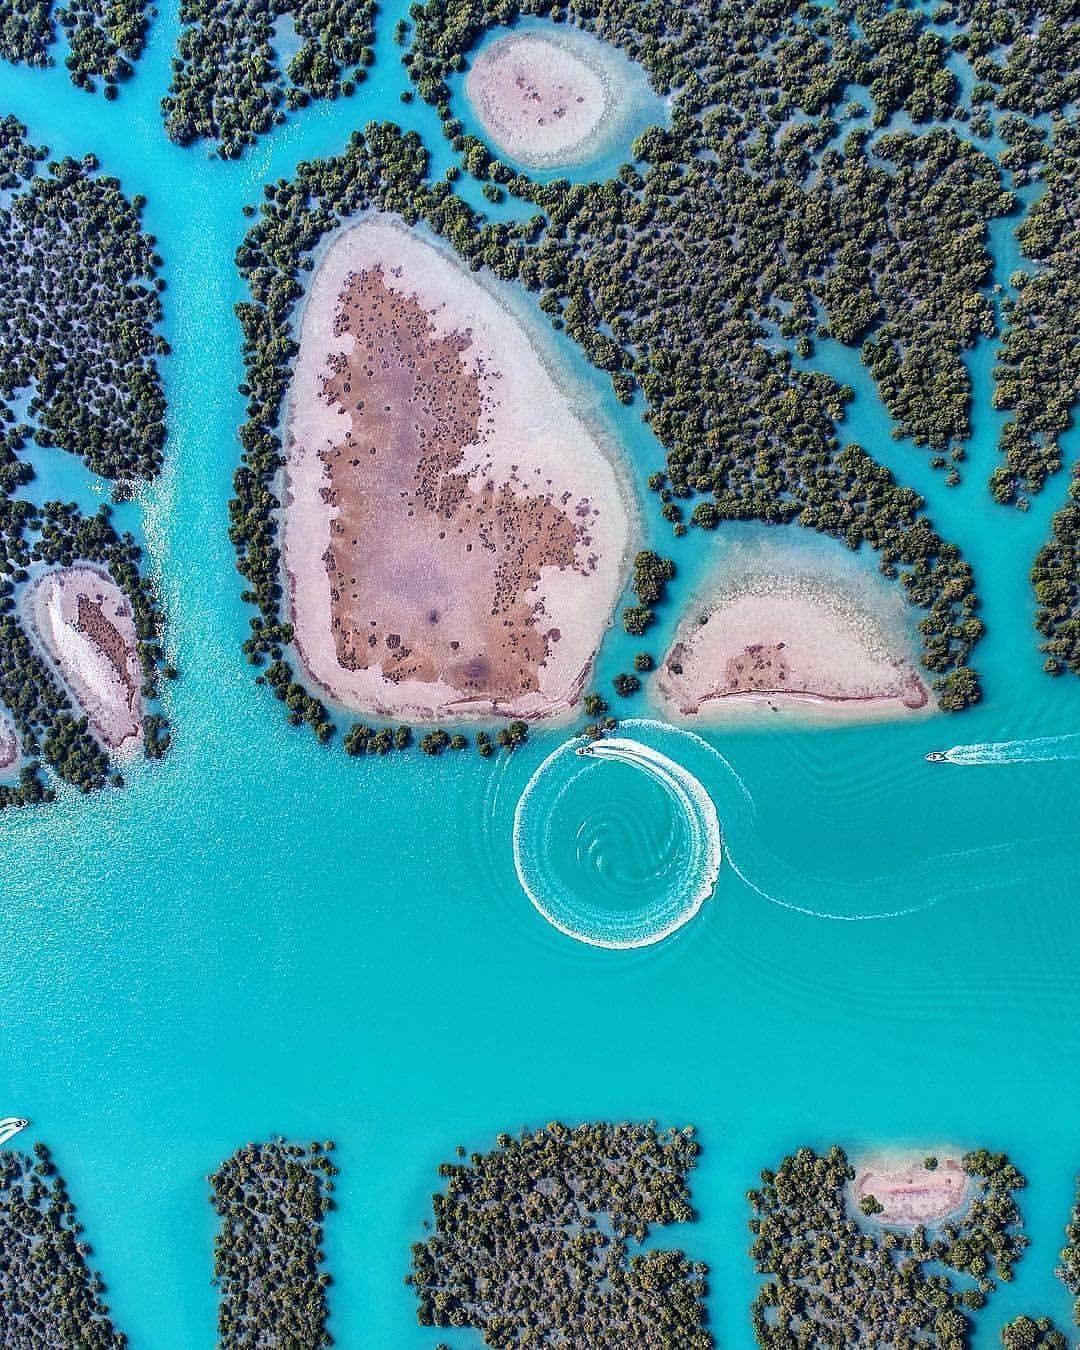 #mangrove #qeshm #adventure #حرا #قشم #ماجراجویی